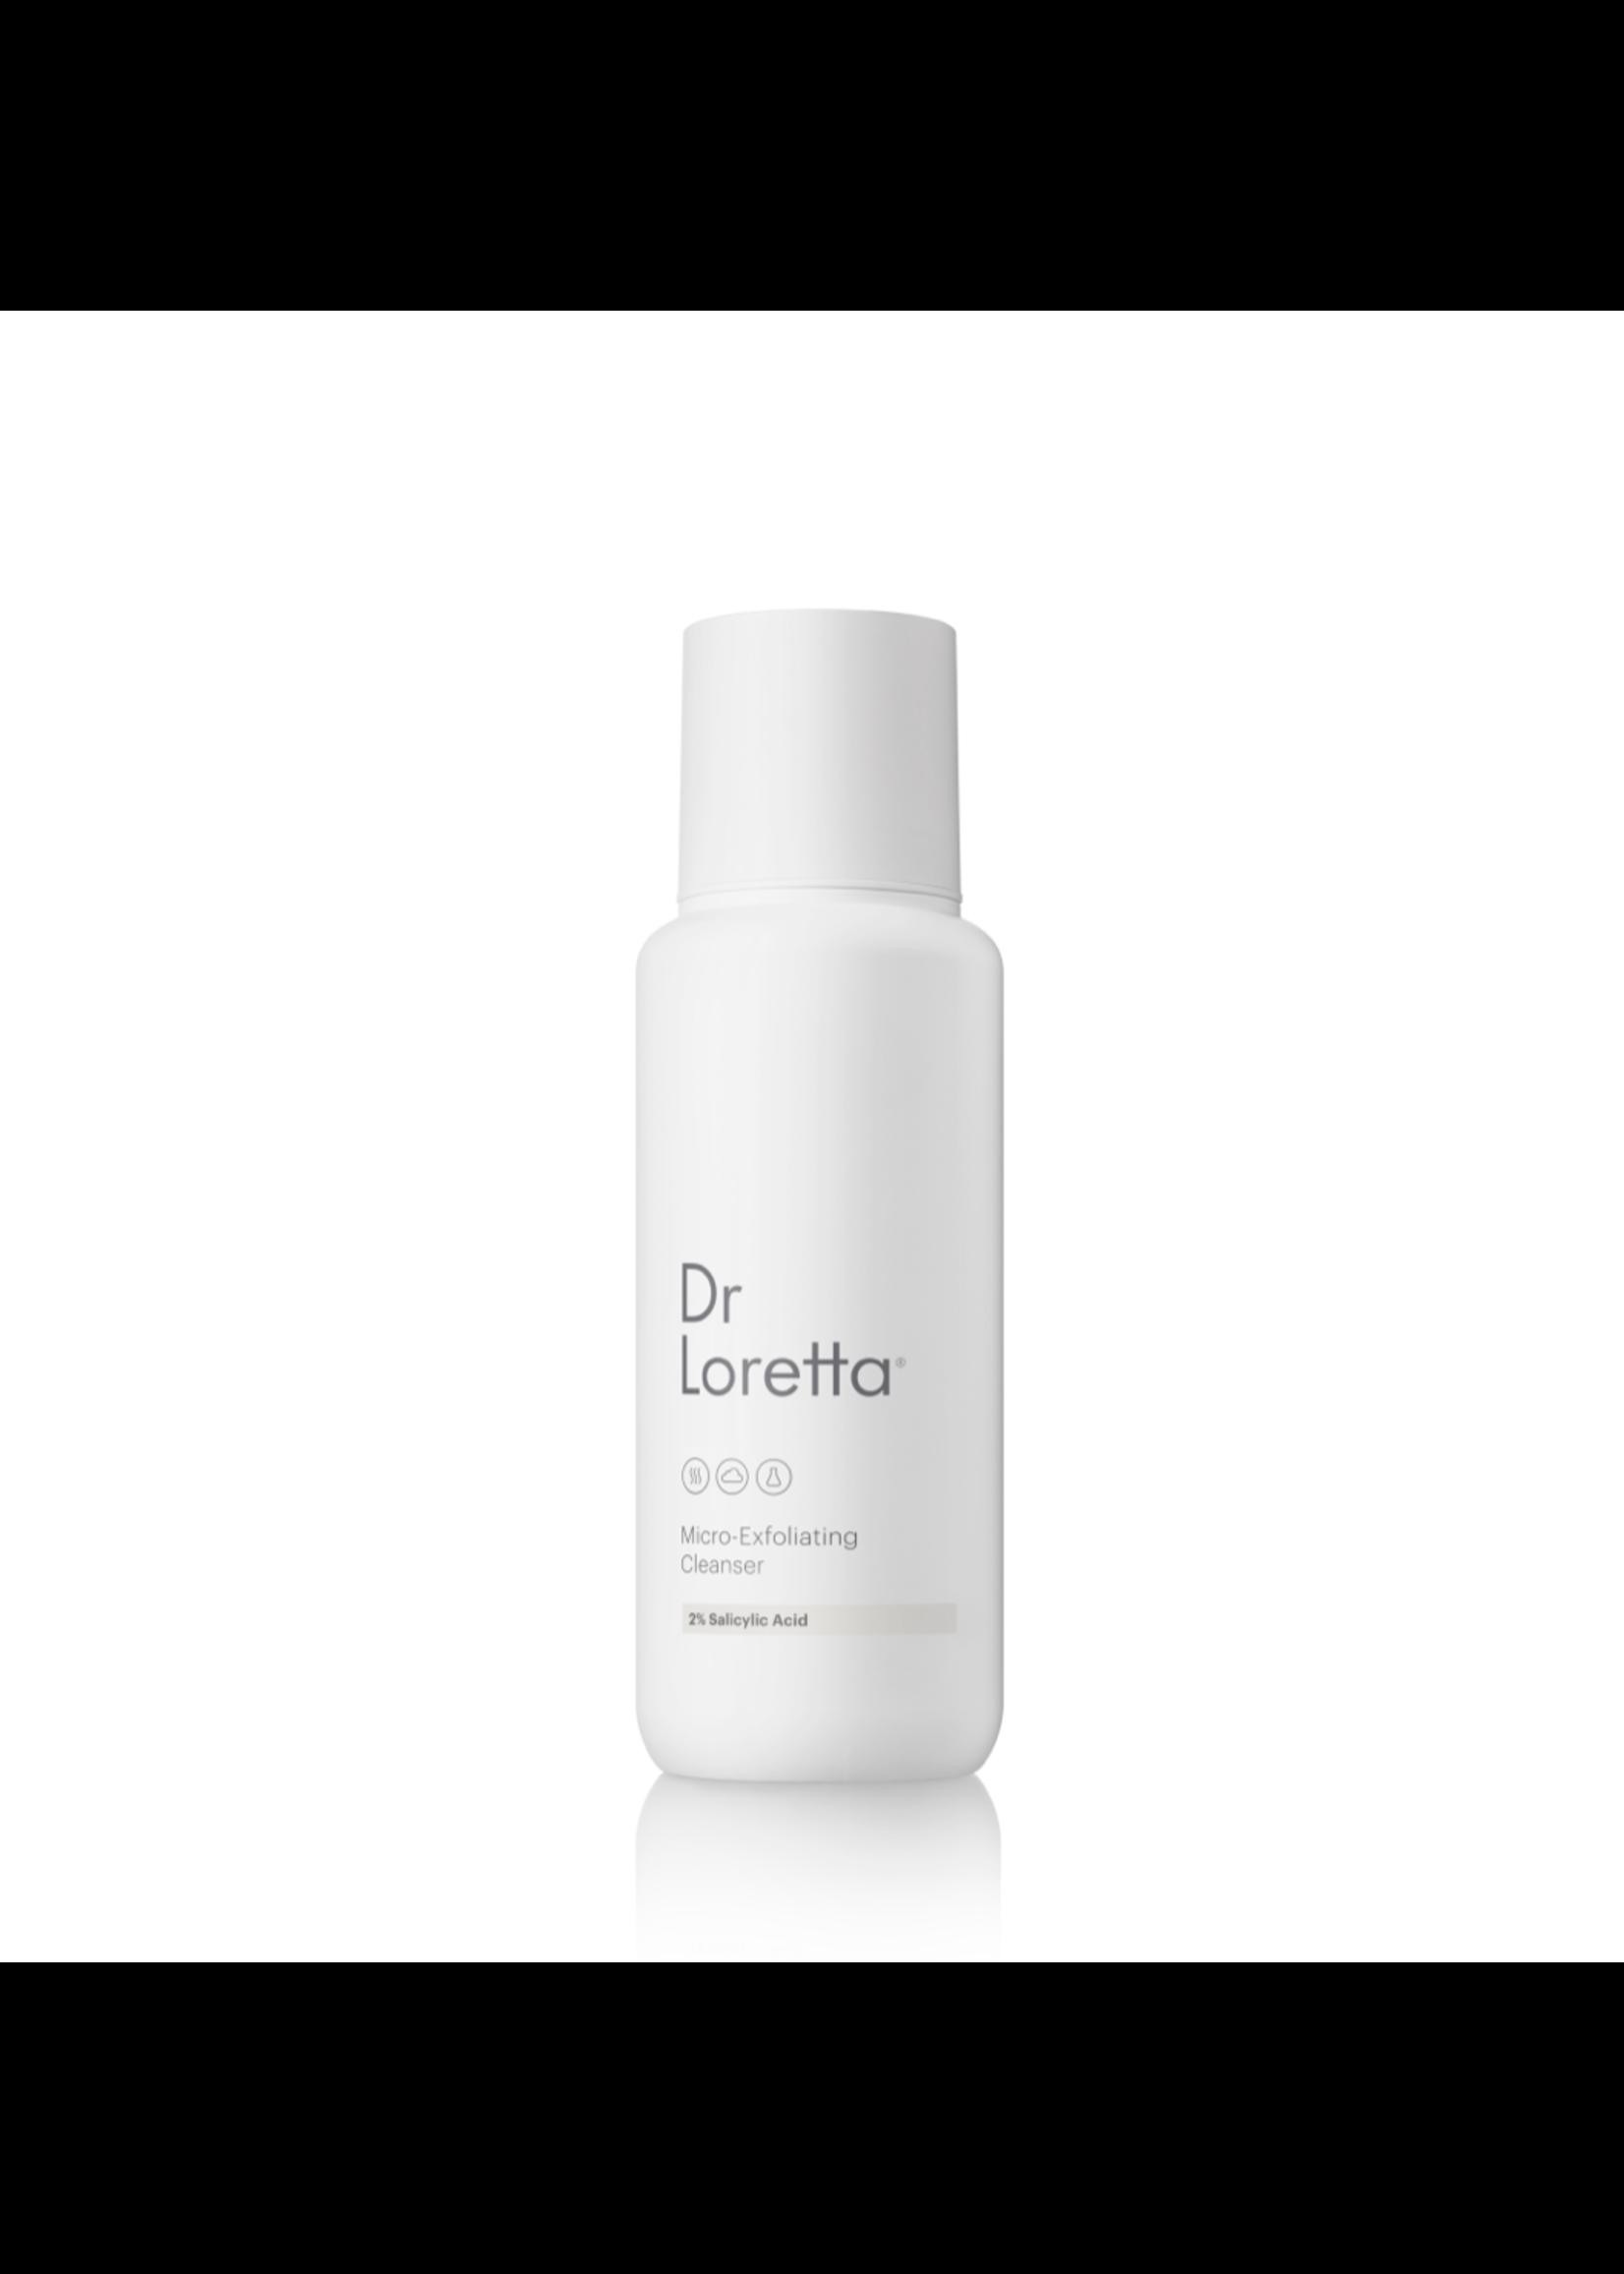 Dr Loretta Micro-Exfoliating Cleanser 6.7oz